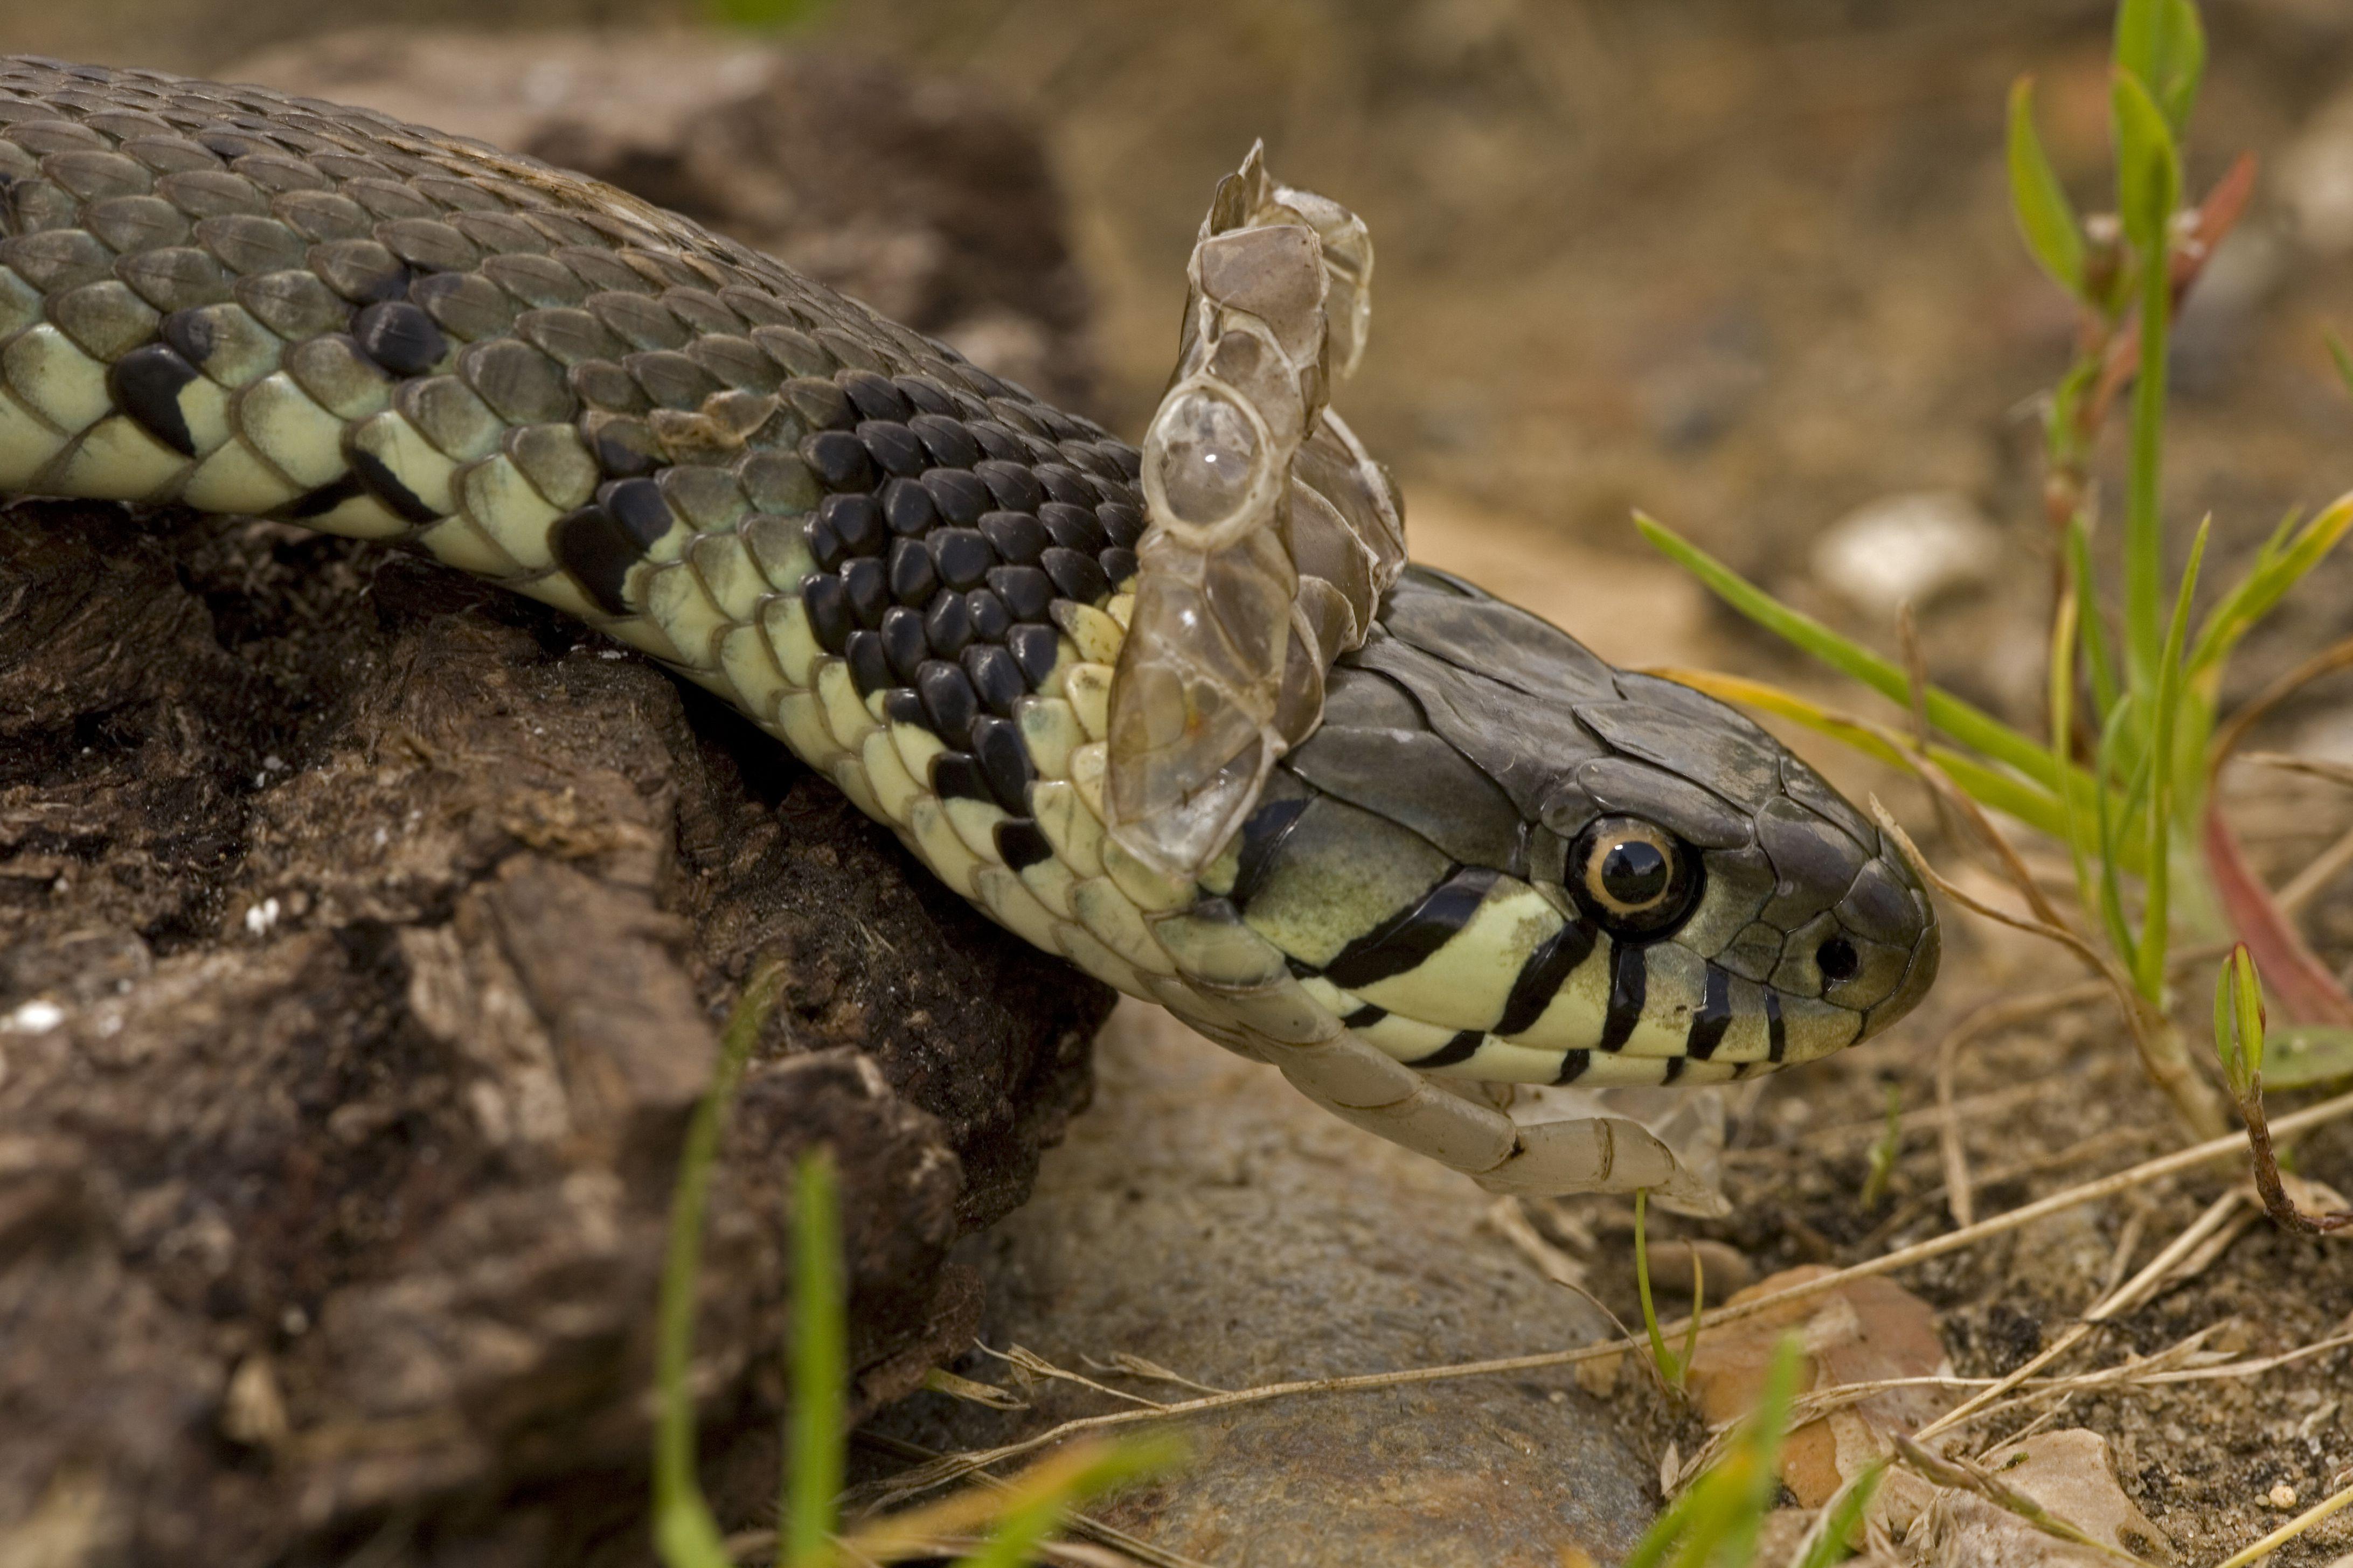 Grass Snake, Natrix natrix, shedding skin